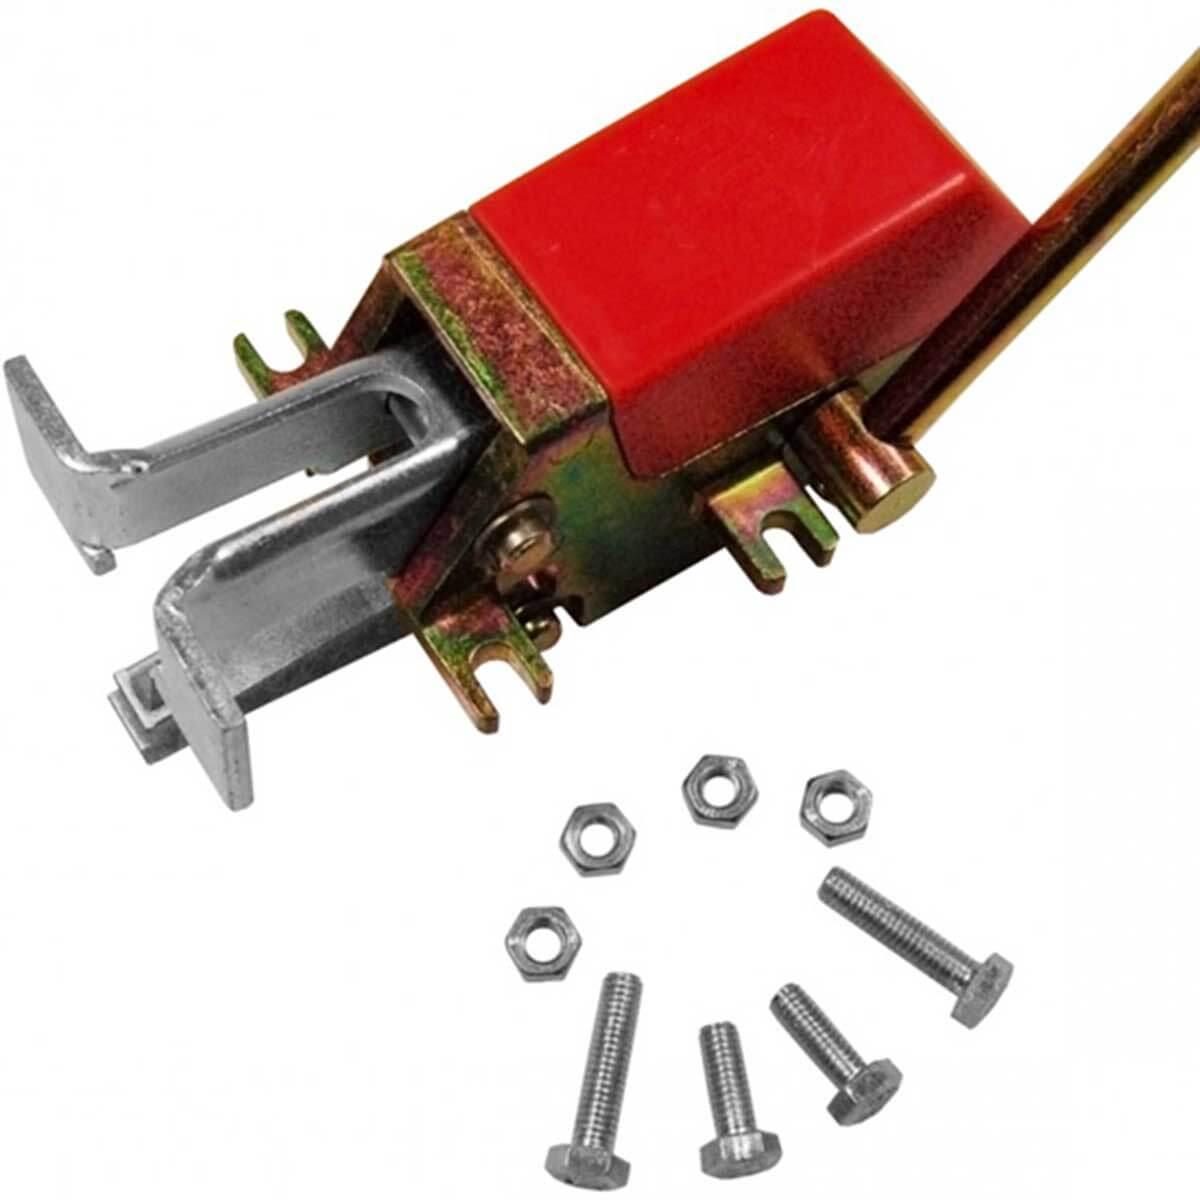 Rubi Breaker Classic Ts Manual Cutters. Contractors Direct